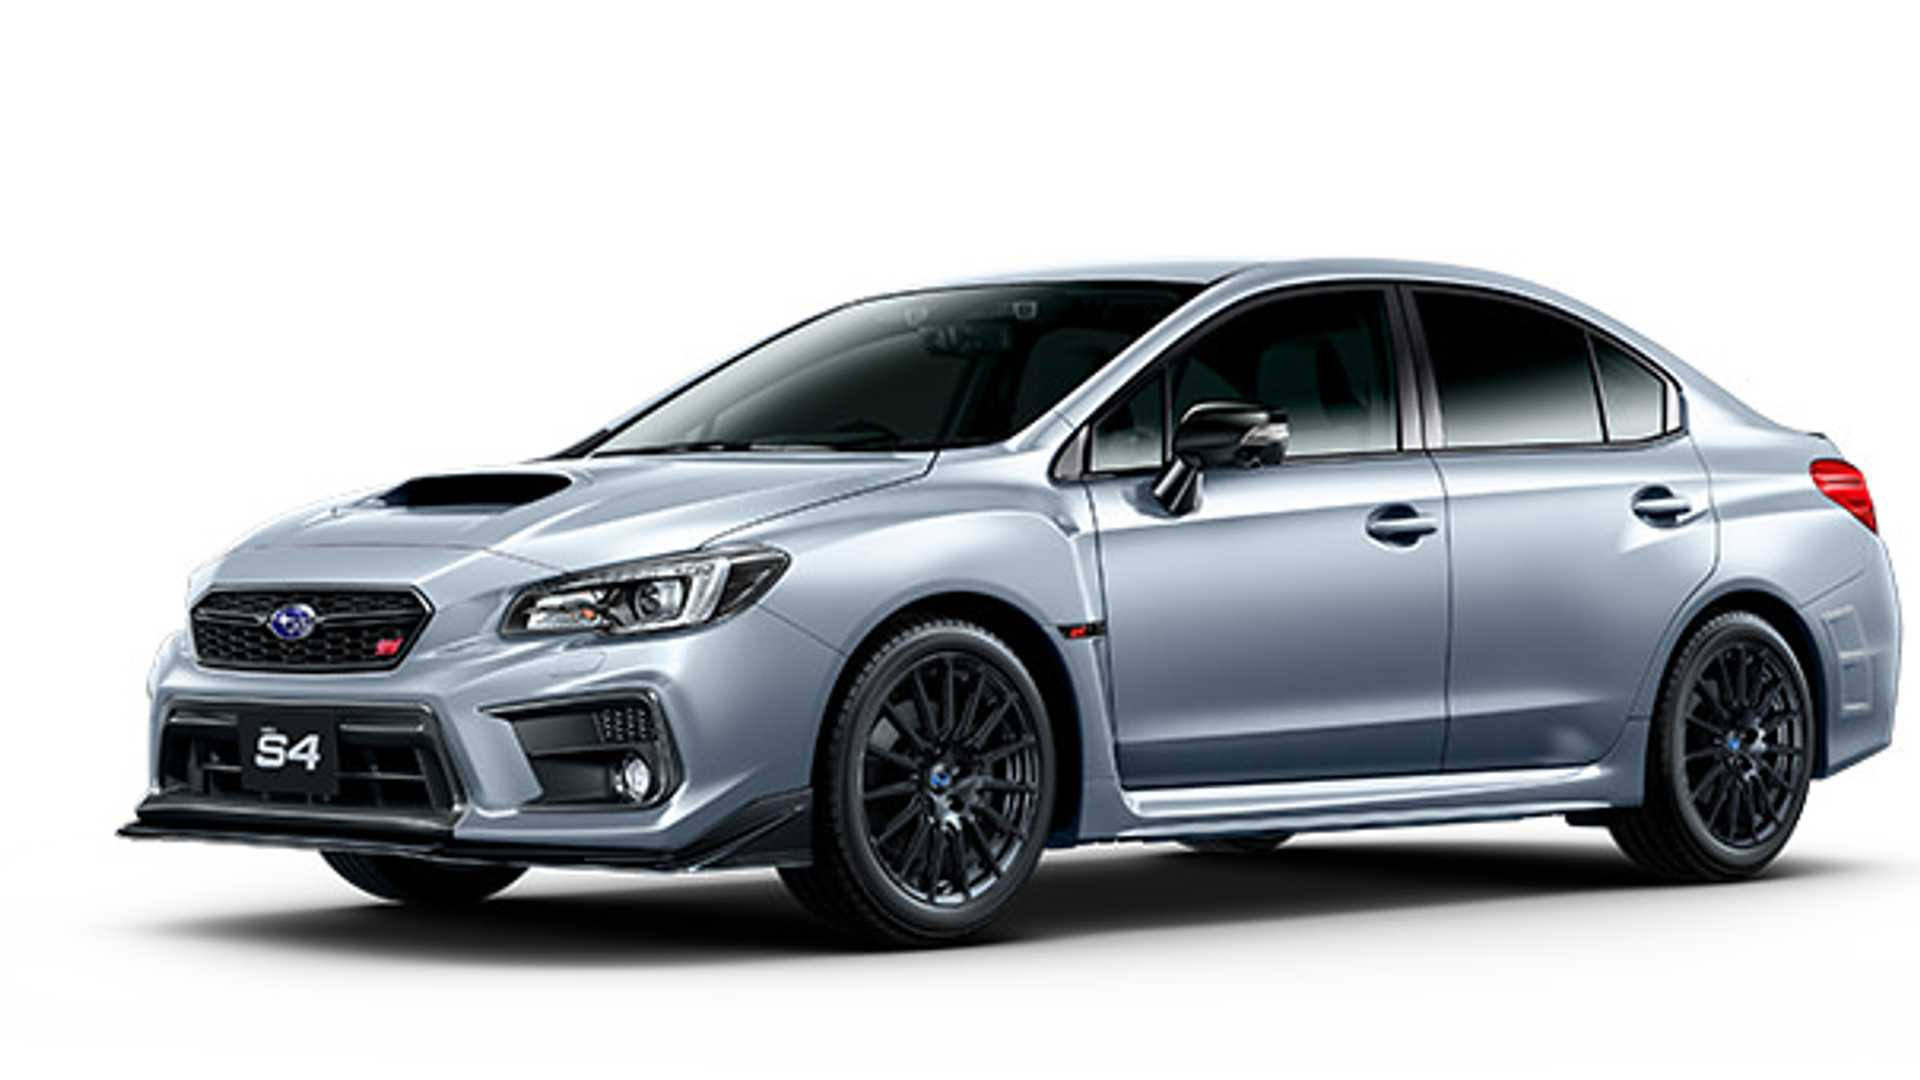 Subaru-WRX-S4-STI-Sport-Sharp-1